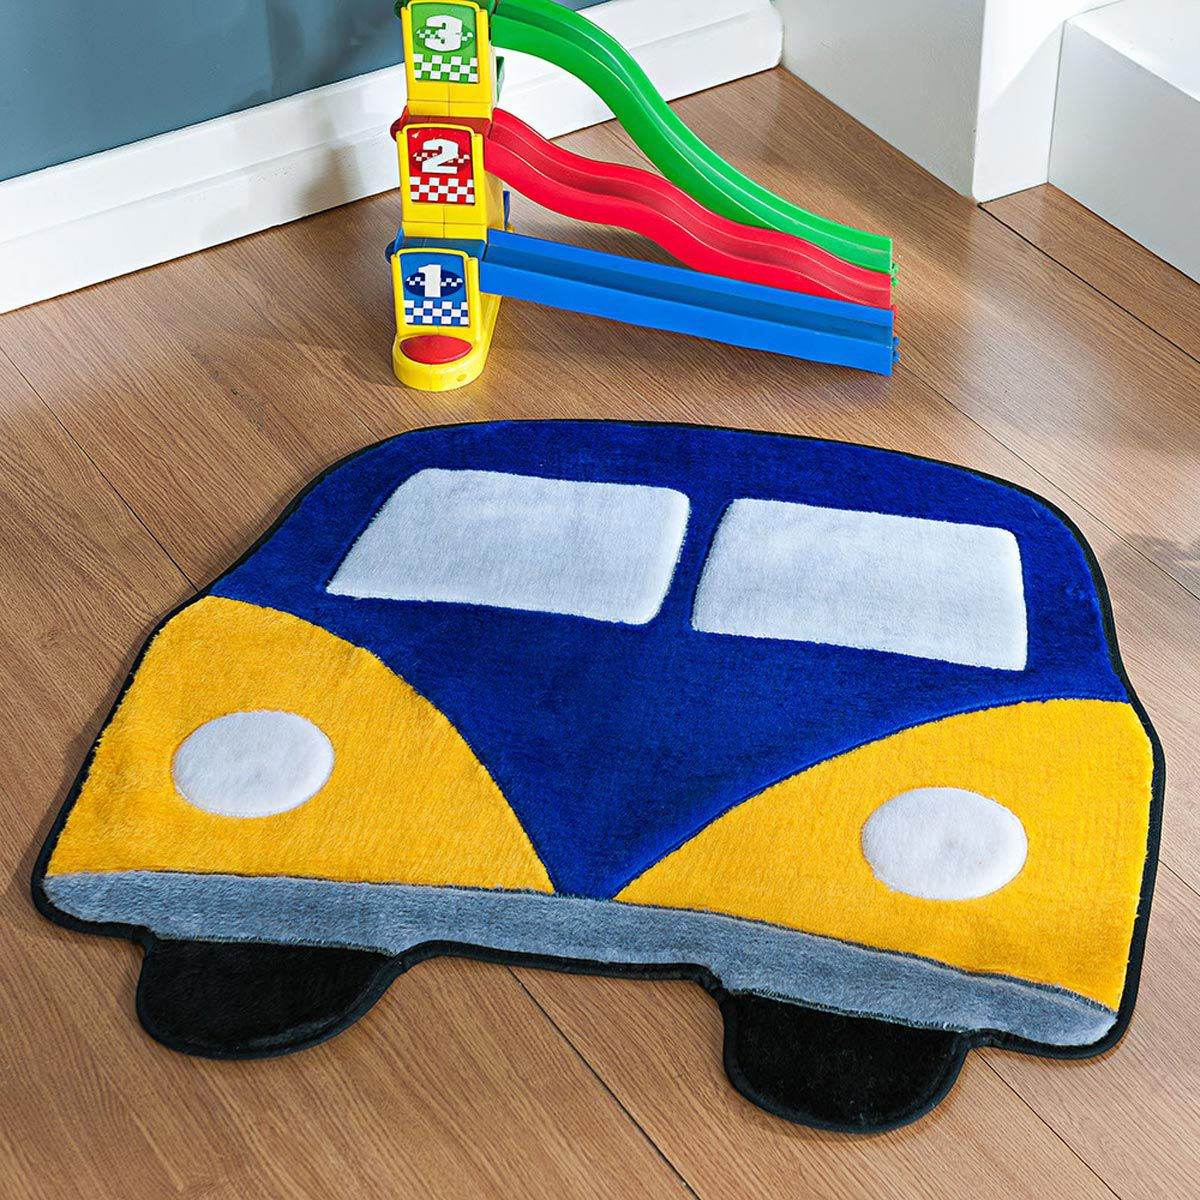 Tapete Infantil Premium Formato Kombi Azul Royal 66cm x 66cm